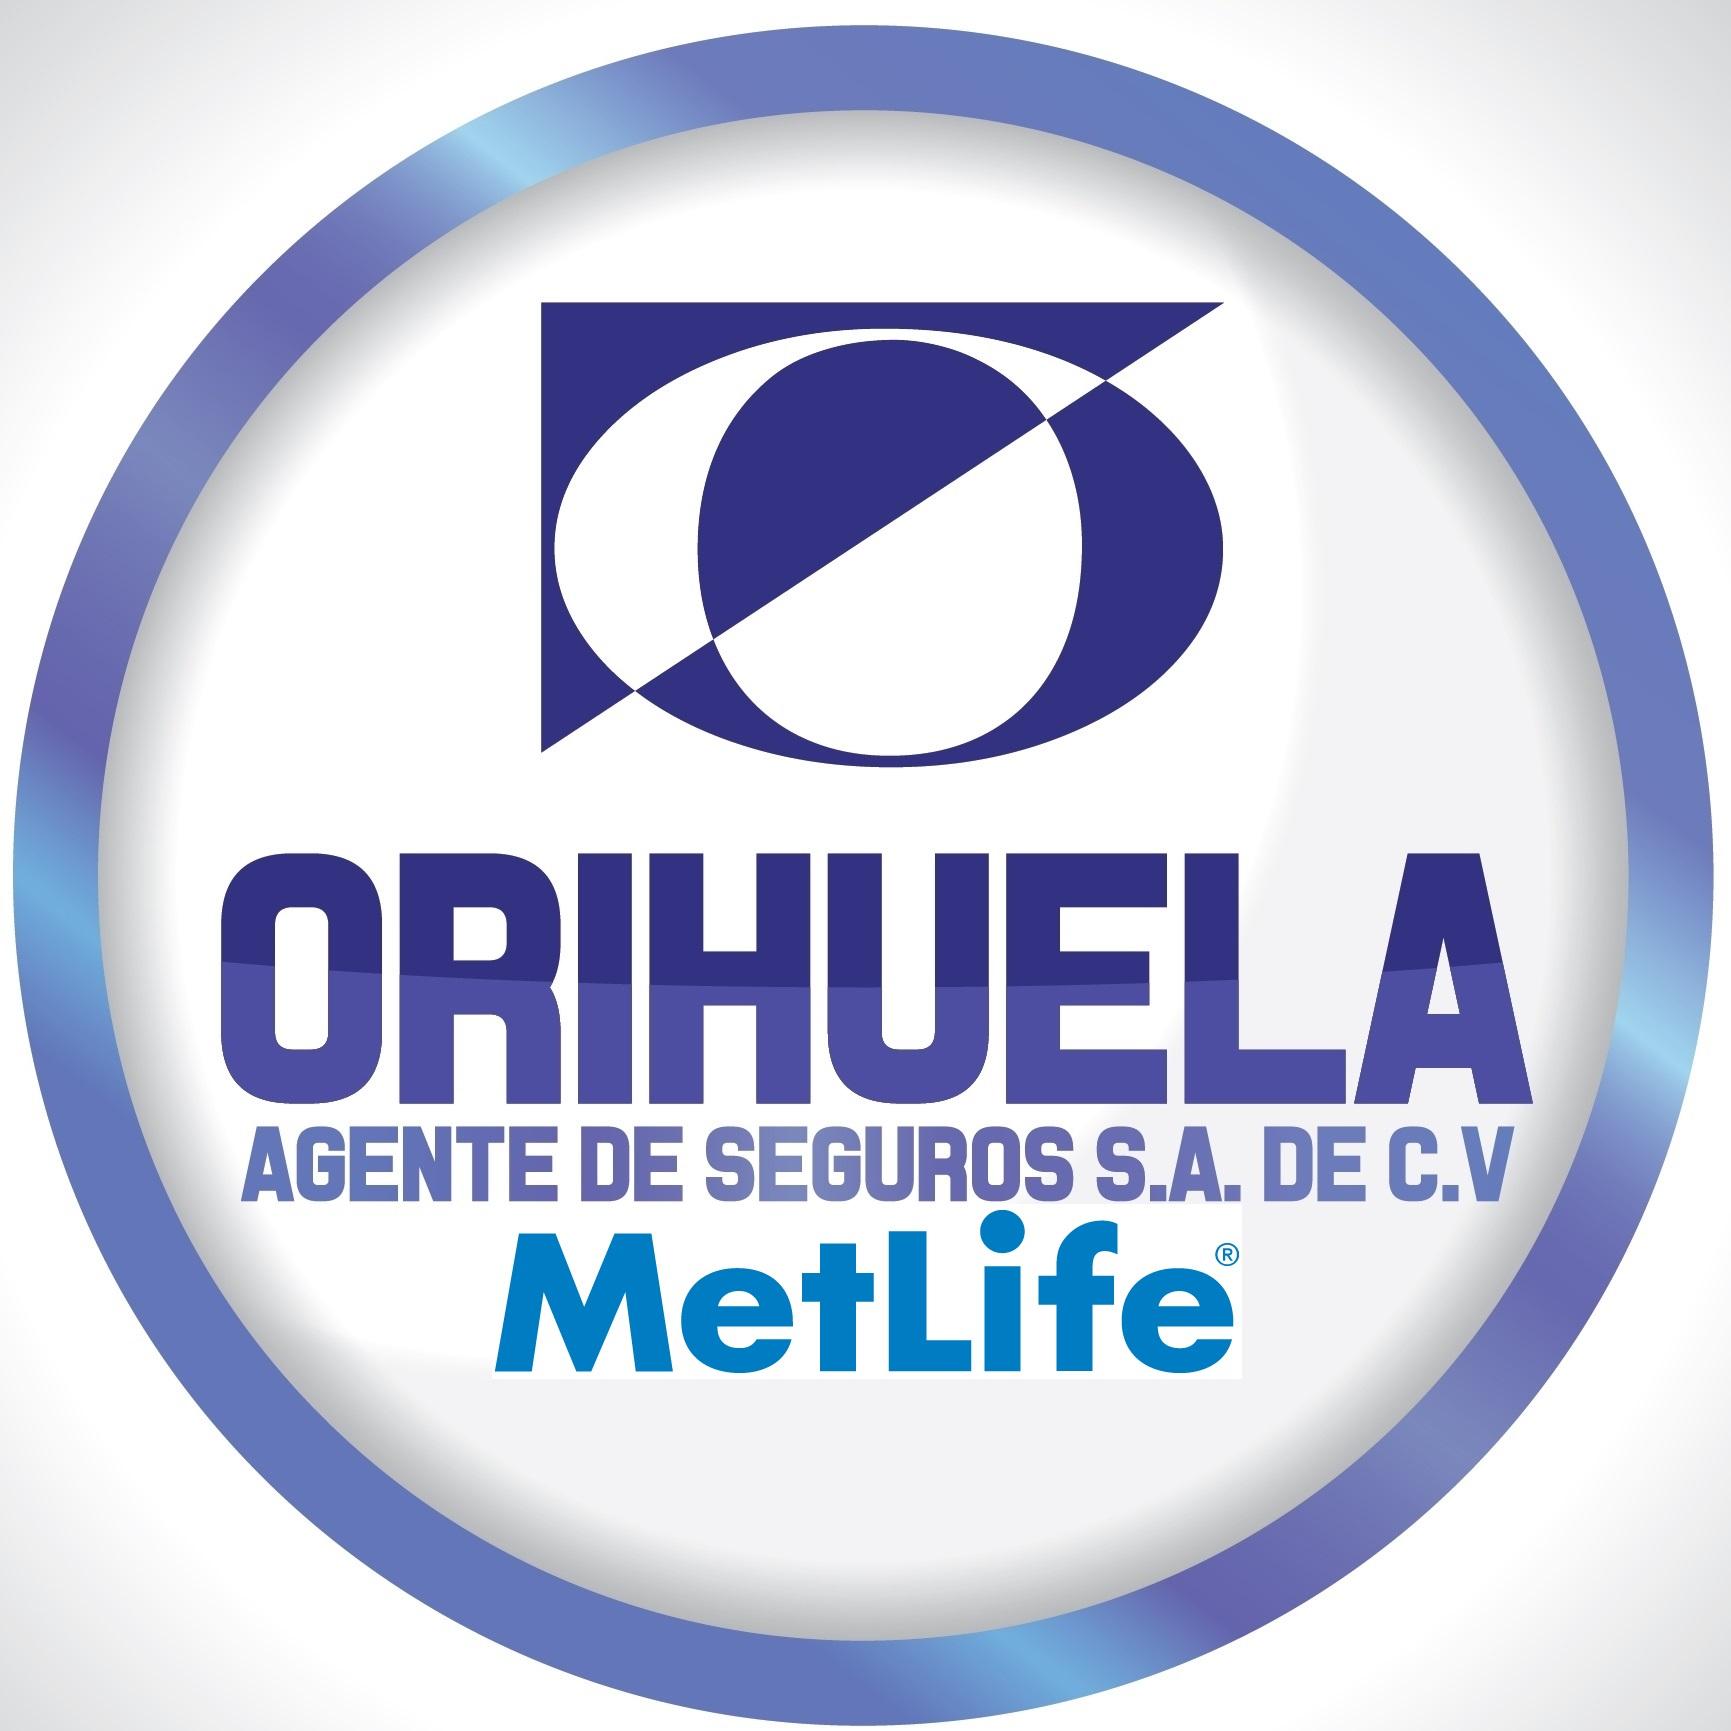 Perfil de MetLife México.